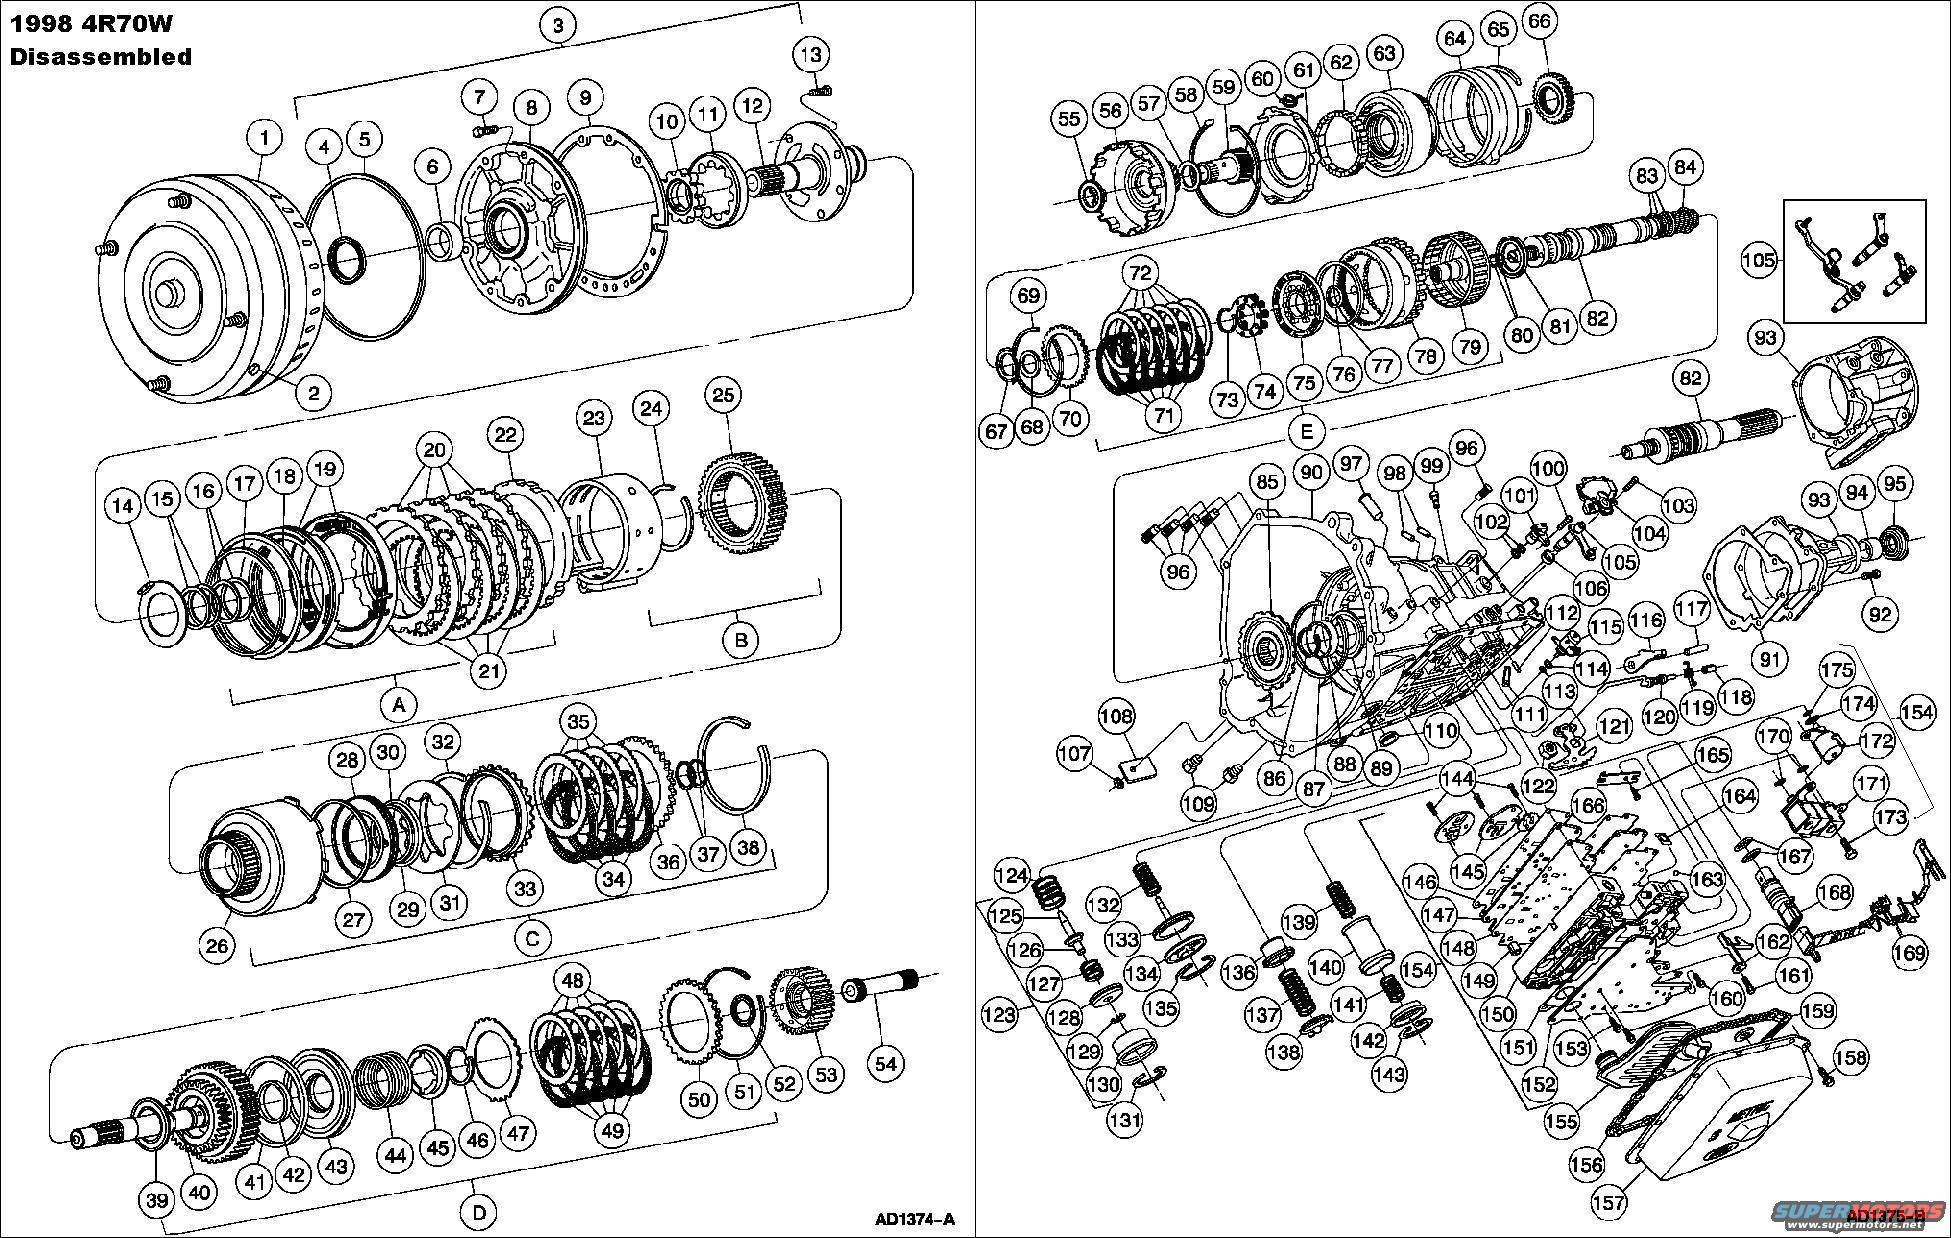 F700 Hydraulic Brake System Diagram On 89 Dodge Van Wiring Diagram